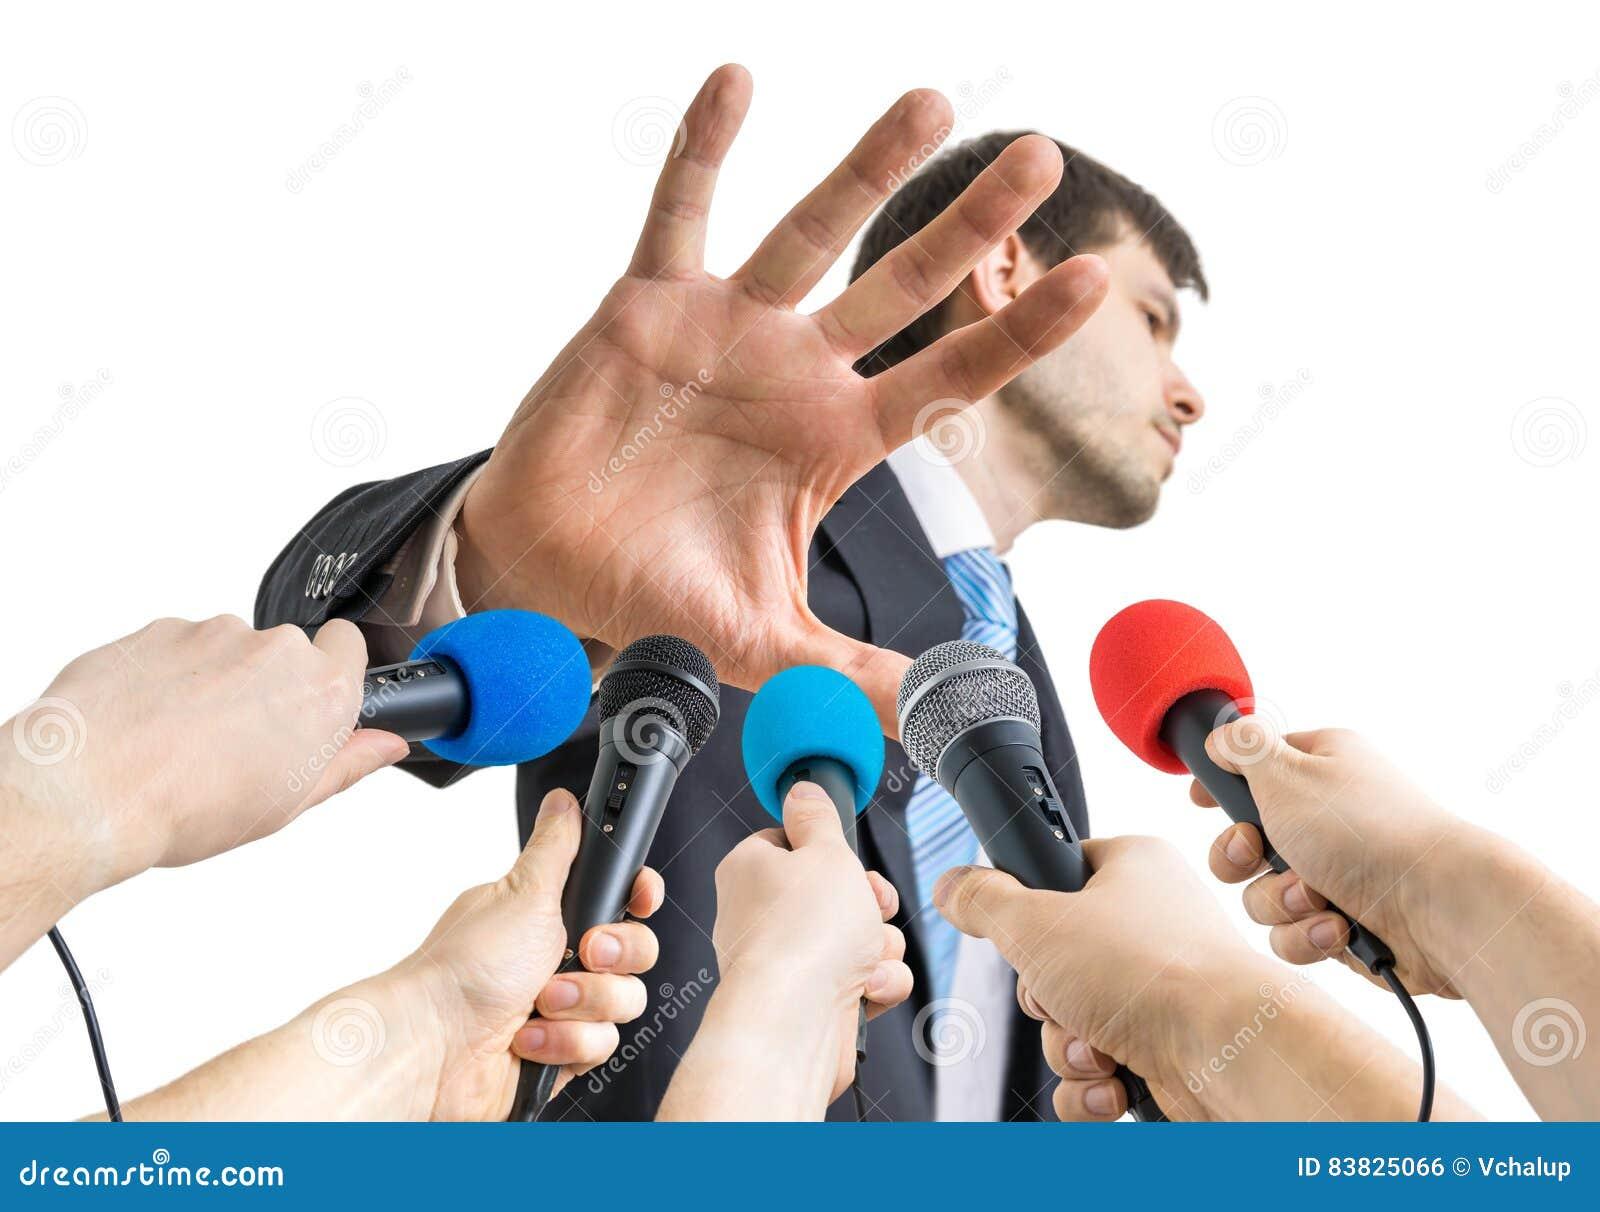 Vele microfoons voor politicus die geen commentaargebaar toont